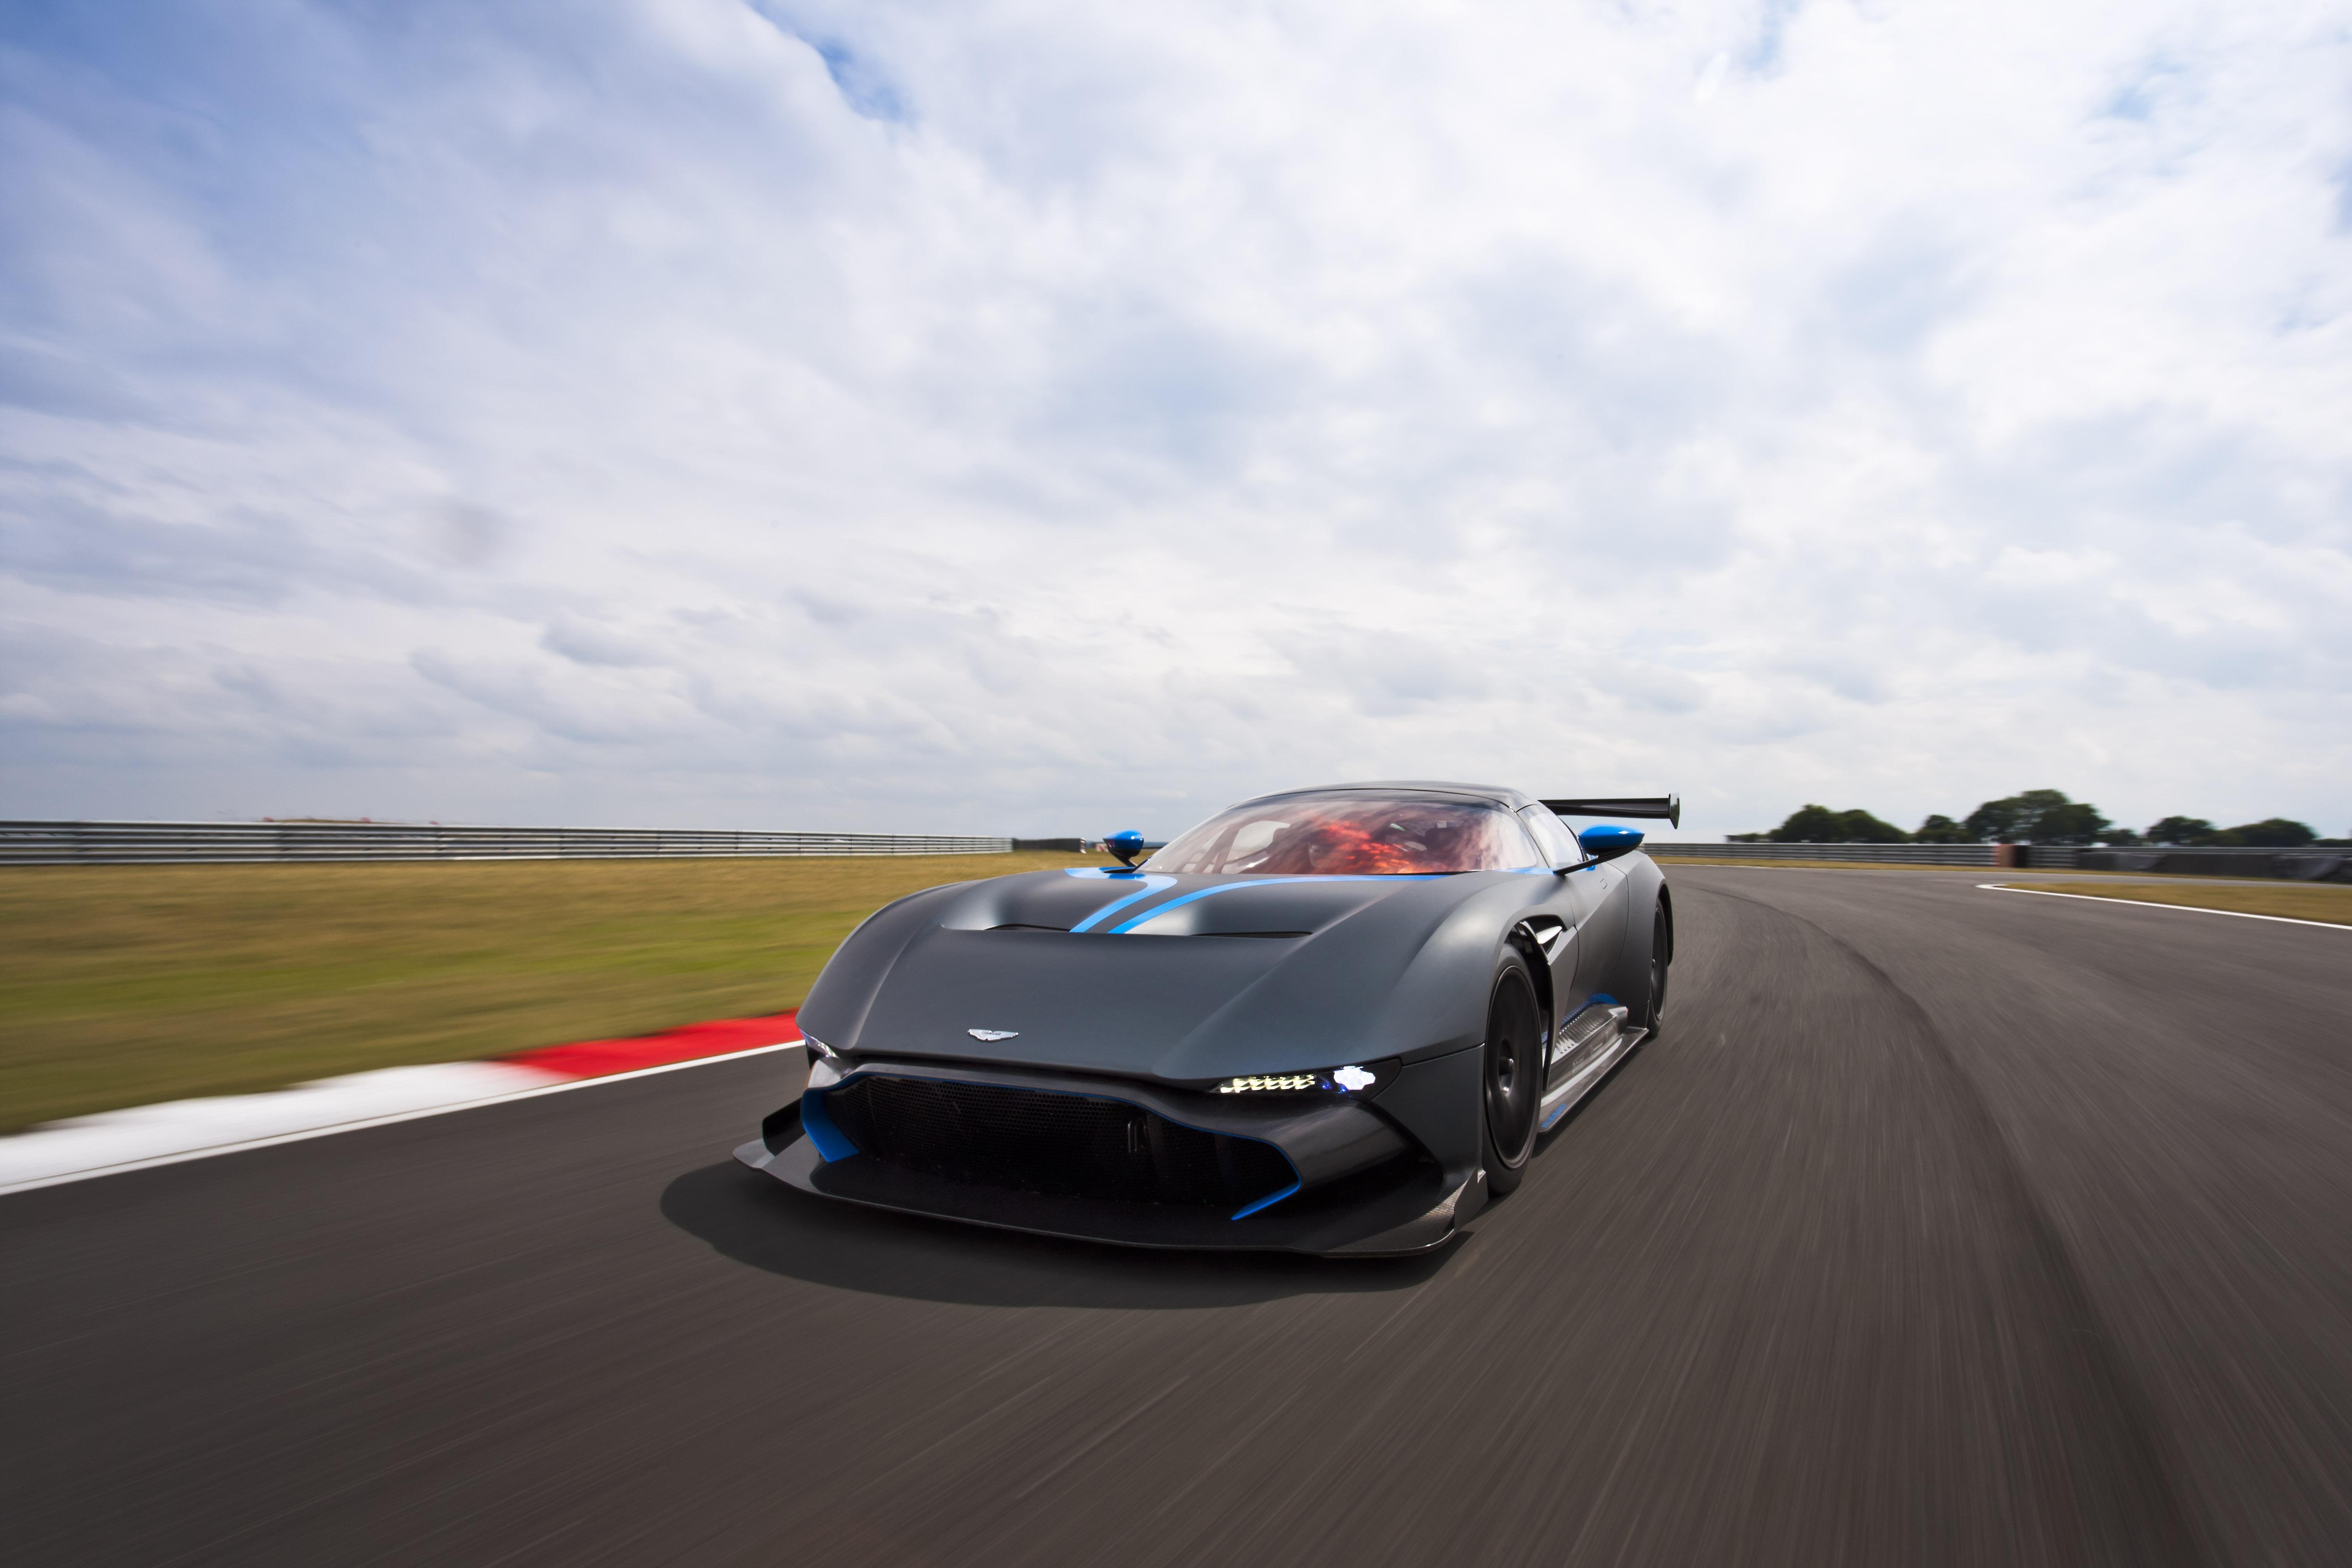 Aston Martin Vulcan Price, Top Speed, Road Legal, News >> Aston Martin Vulcan Review Track Only Aston Reviewed At Blyton